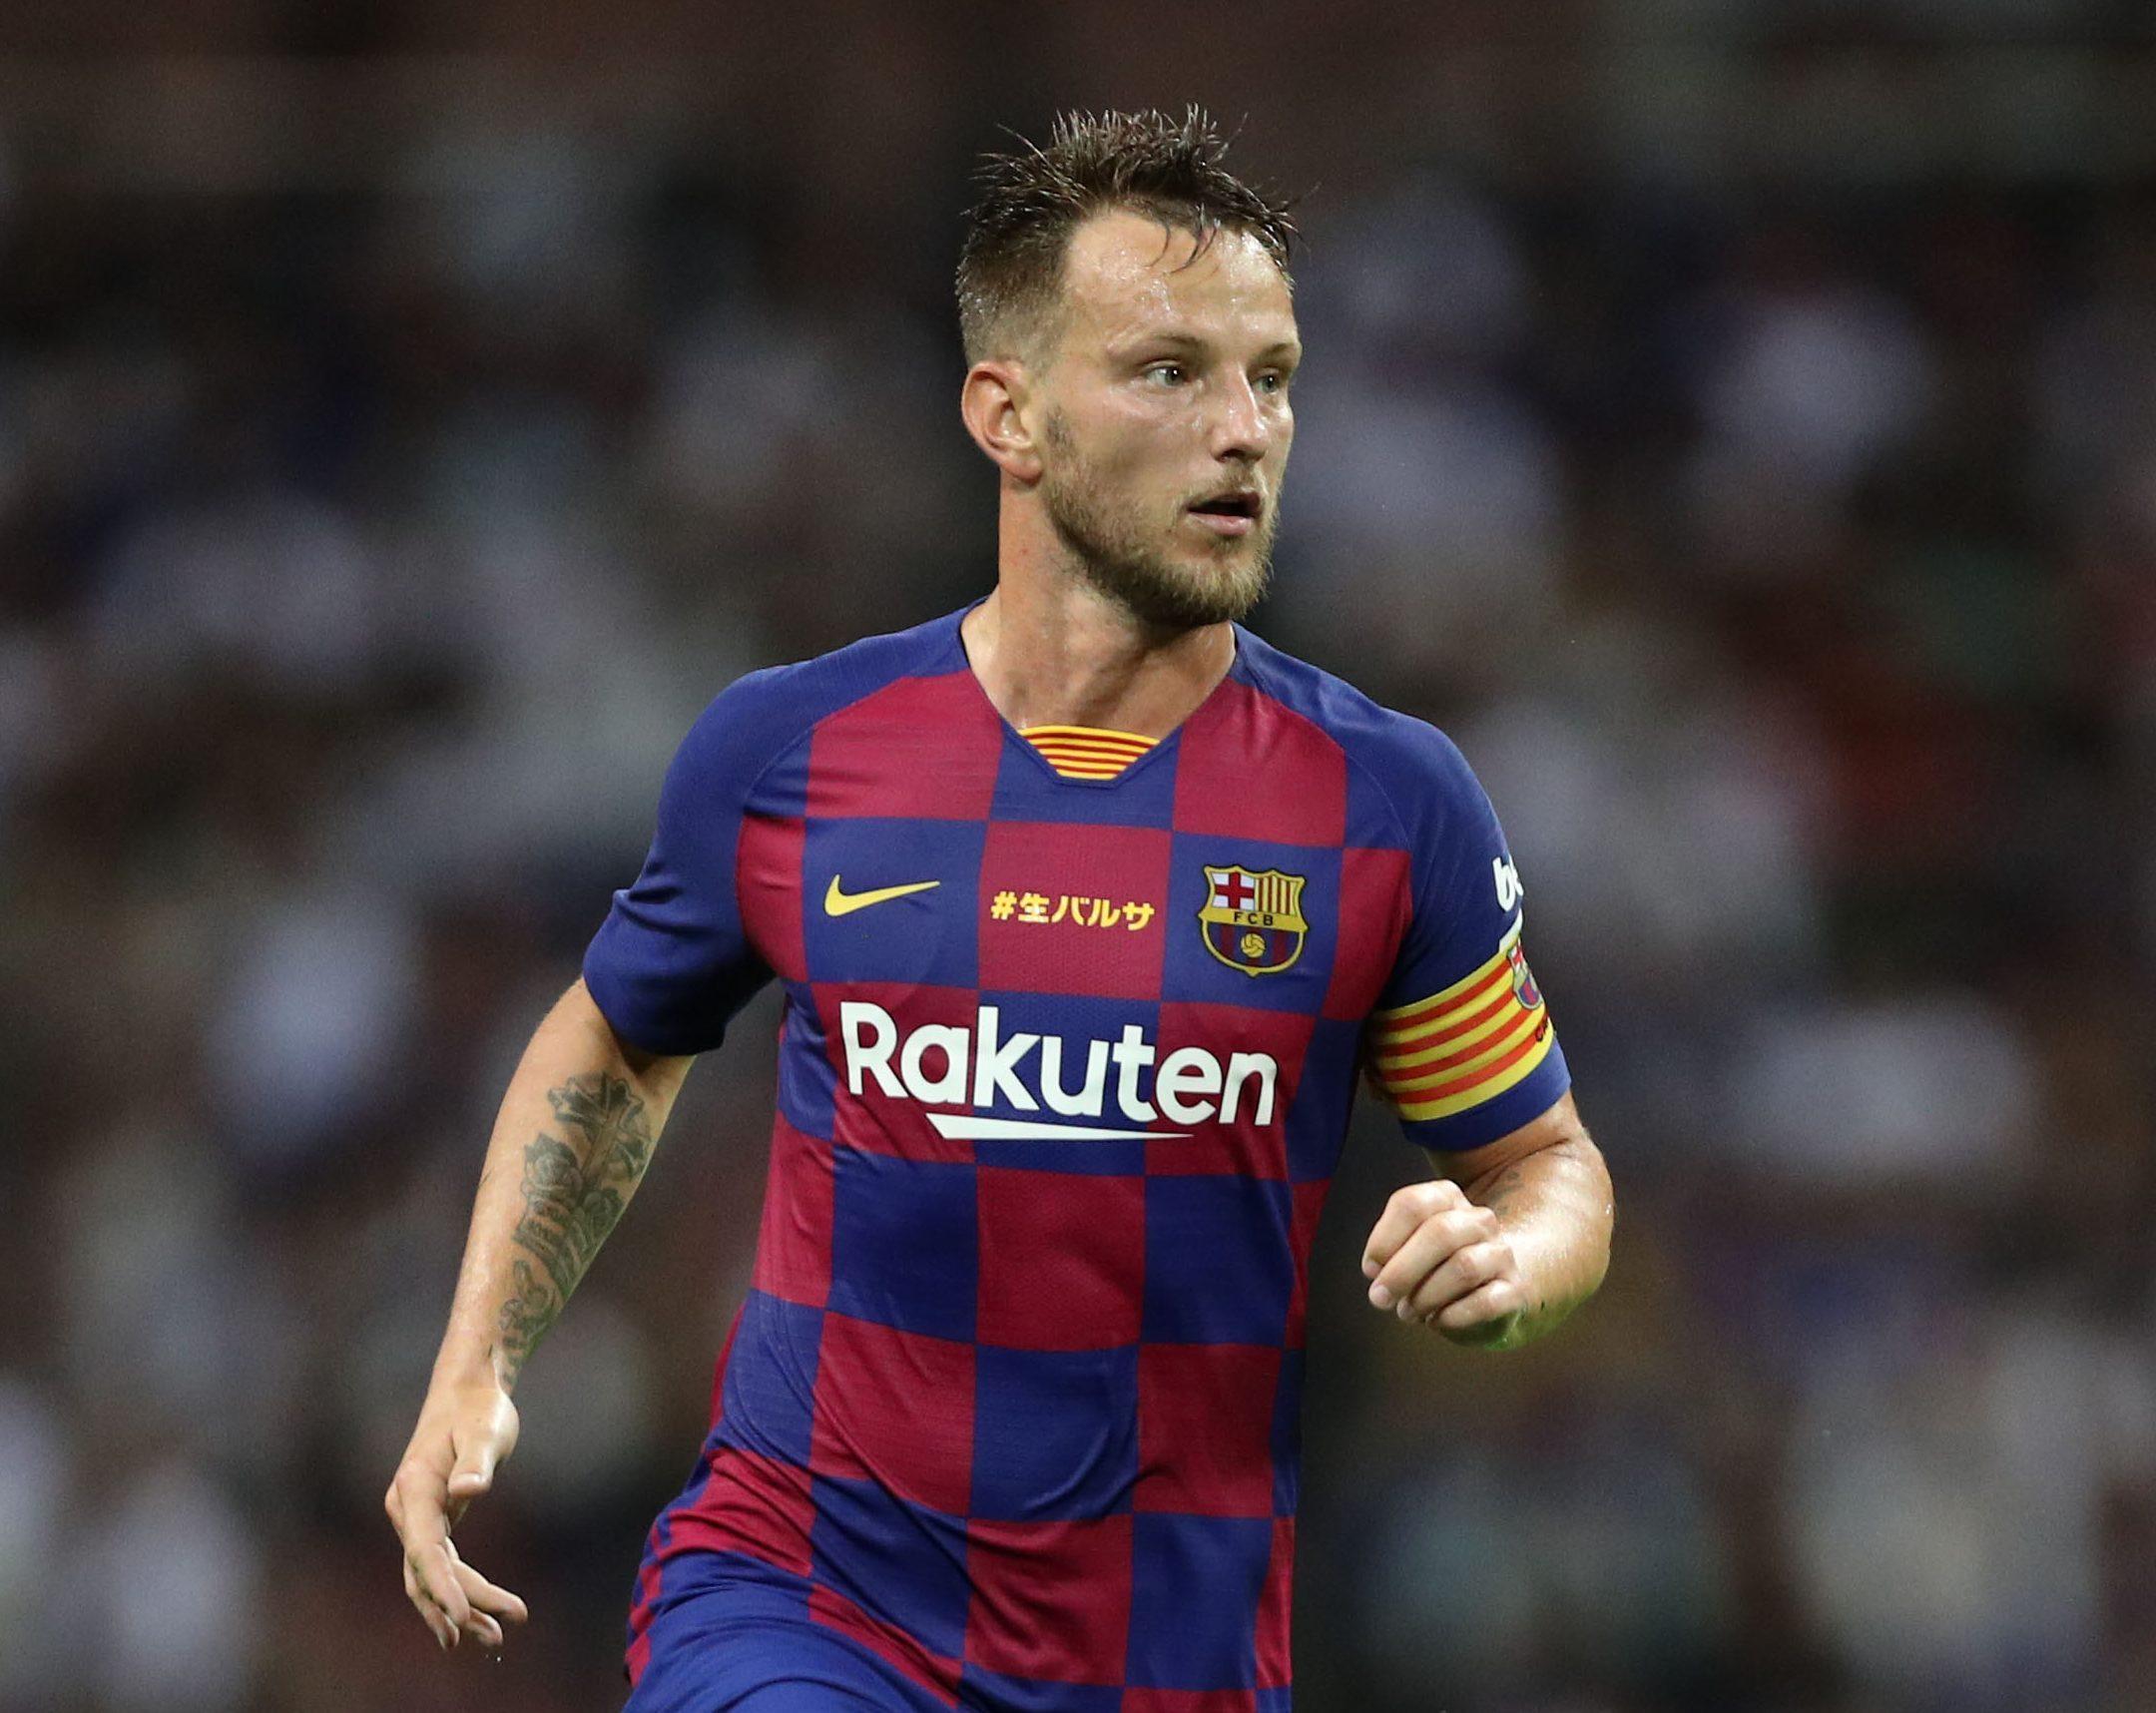 Man Utd receive Ivan Rakitic transfer boost as Croatian issues Barcelona quit threat - Bóng Đá